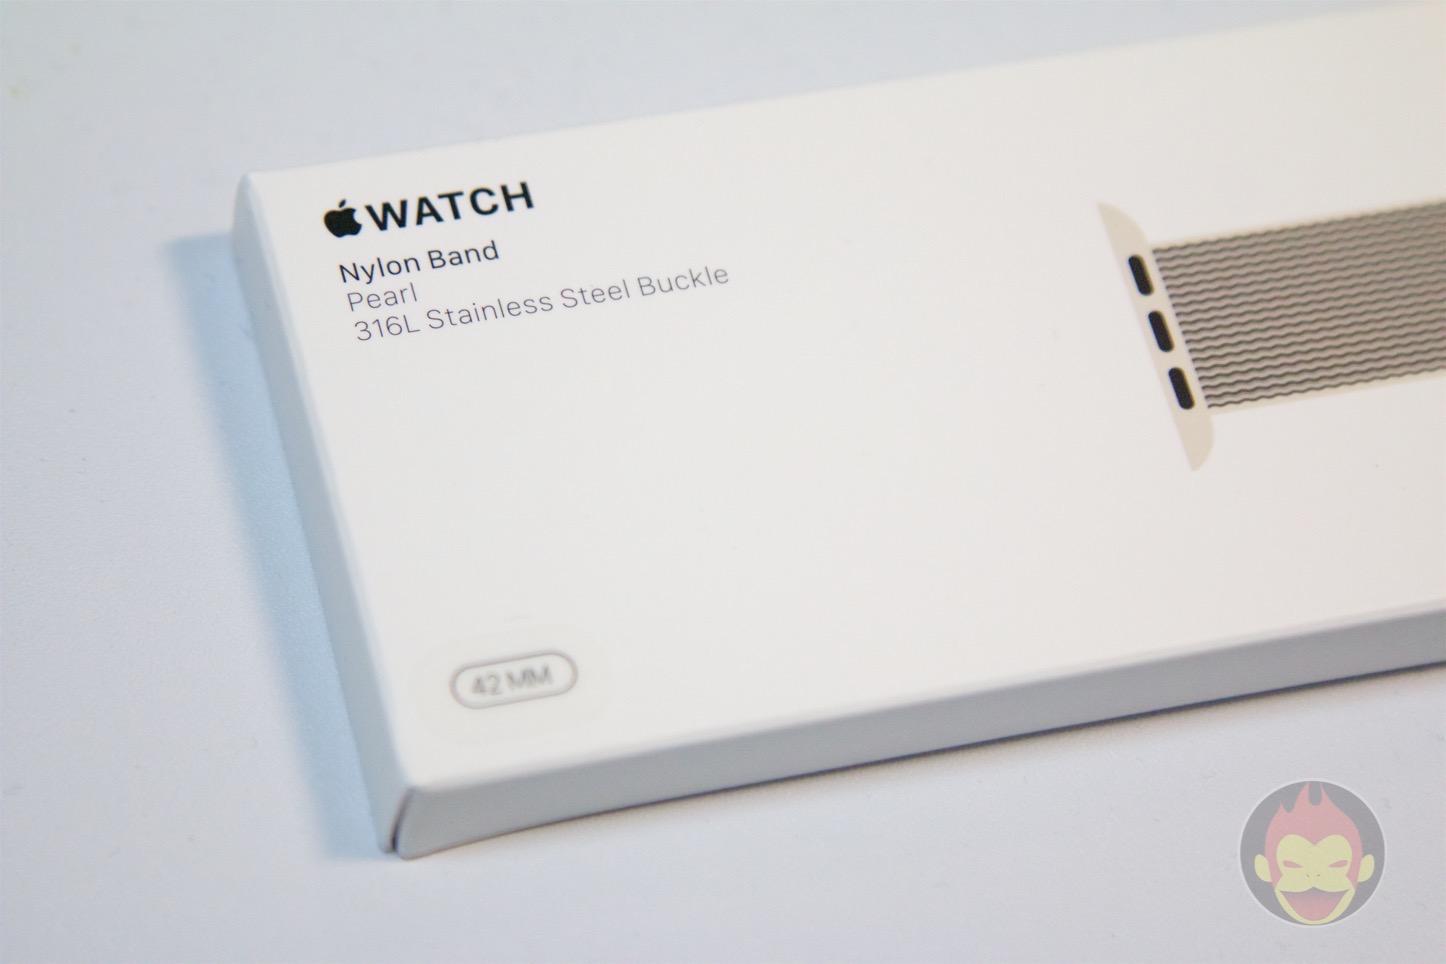 Apple-Watch-Woven-Nylon-Band-01.jpg